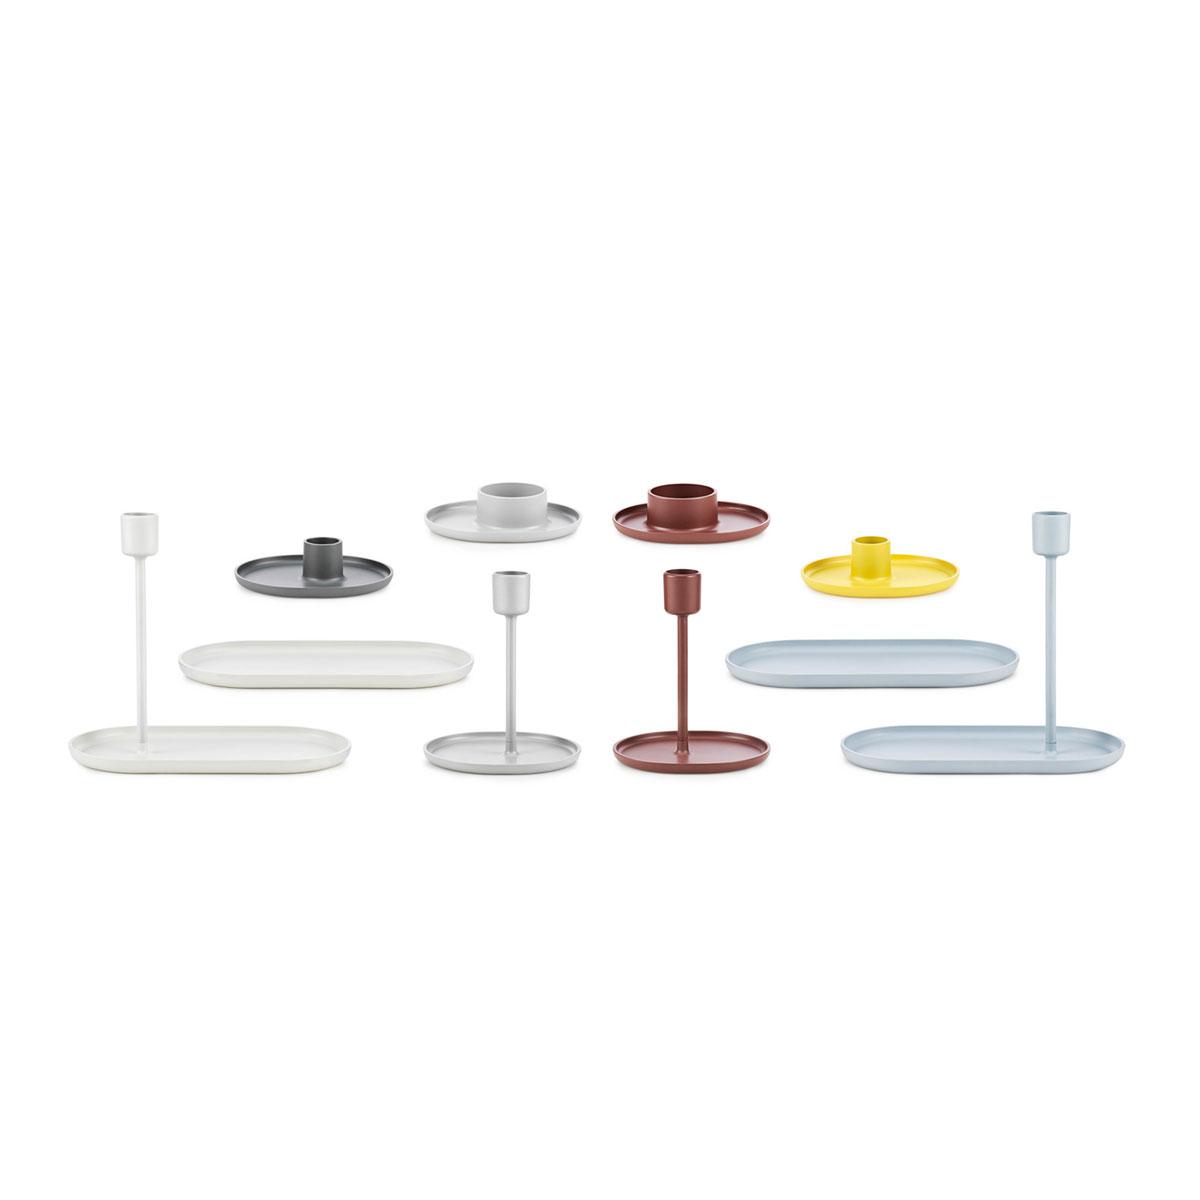 folk normann copenhagen evolution design accessoires. Black Bedroom Furniture Sets. Home Design Ideas